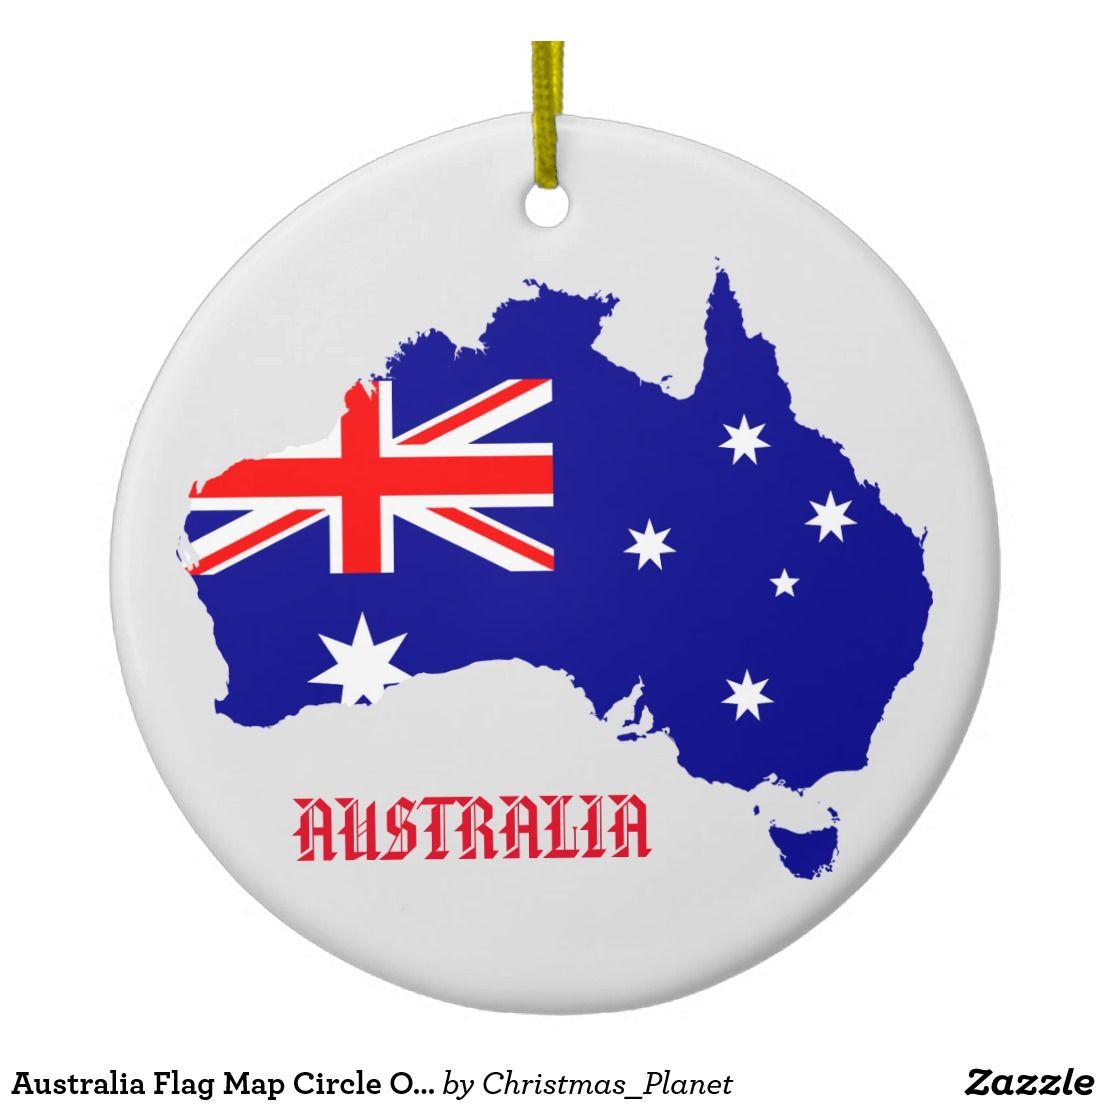 Australia Flag Map Circle Ornament | Zazzle.com ...